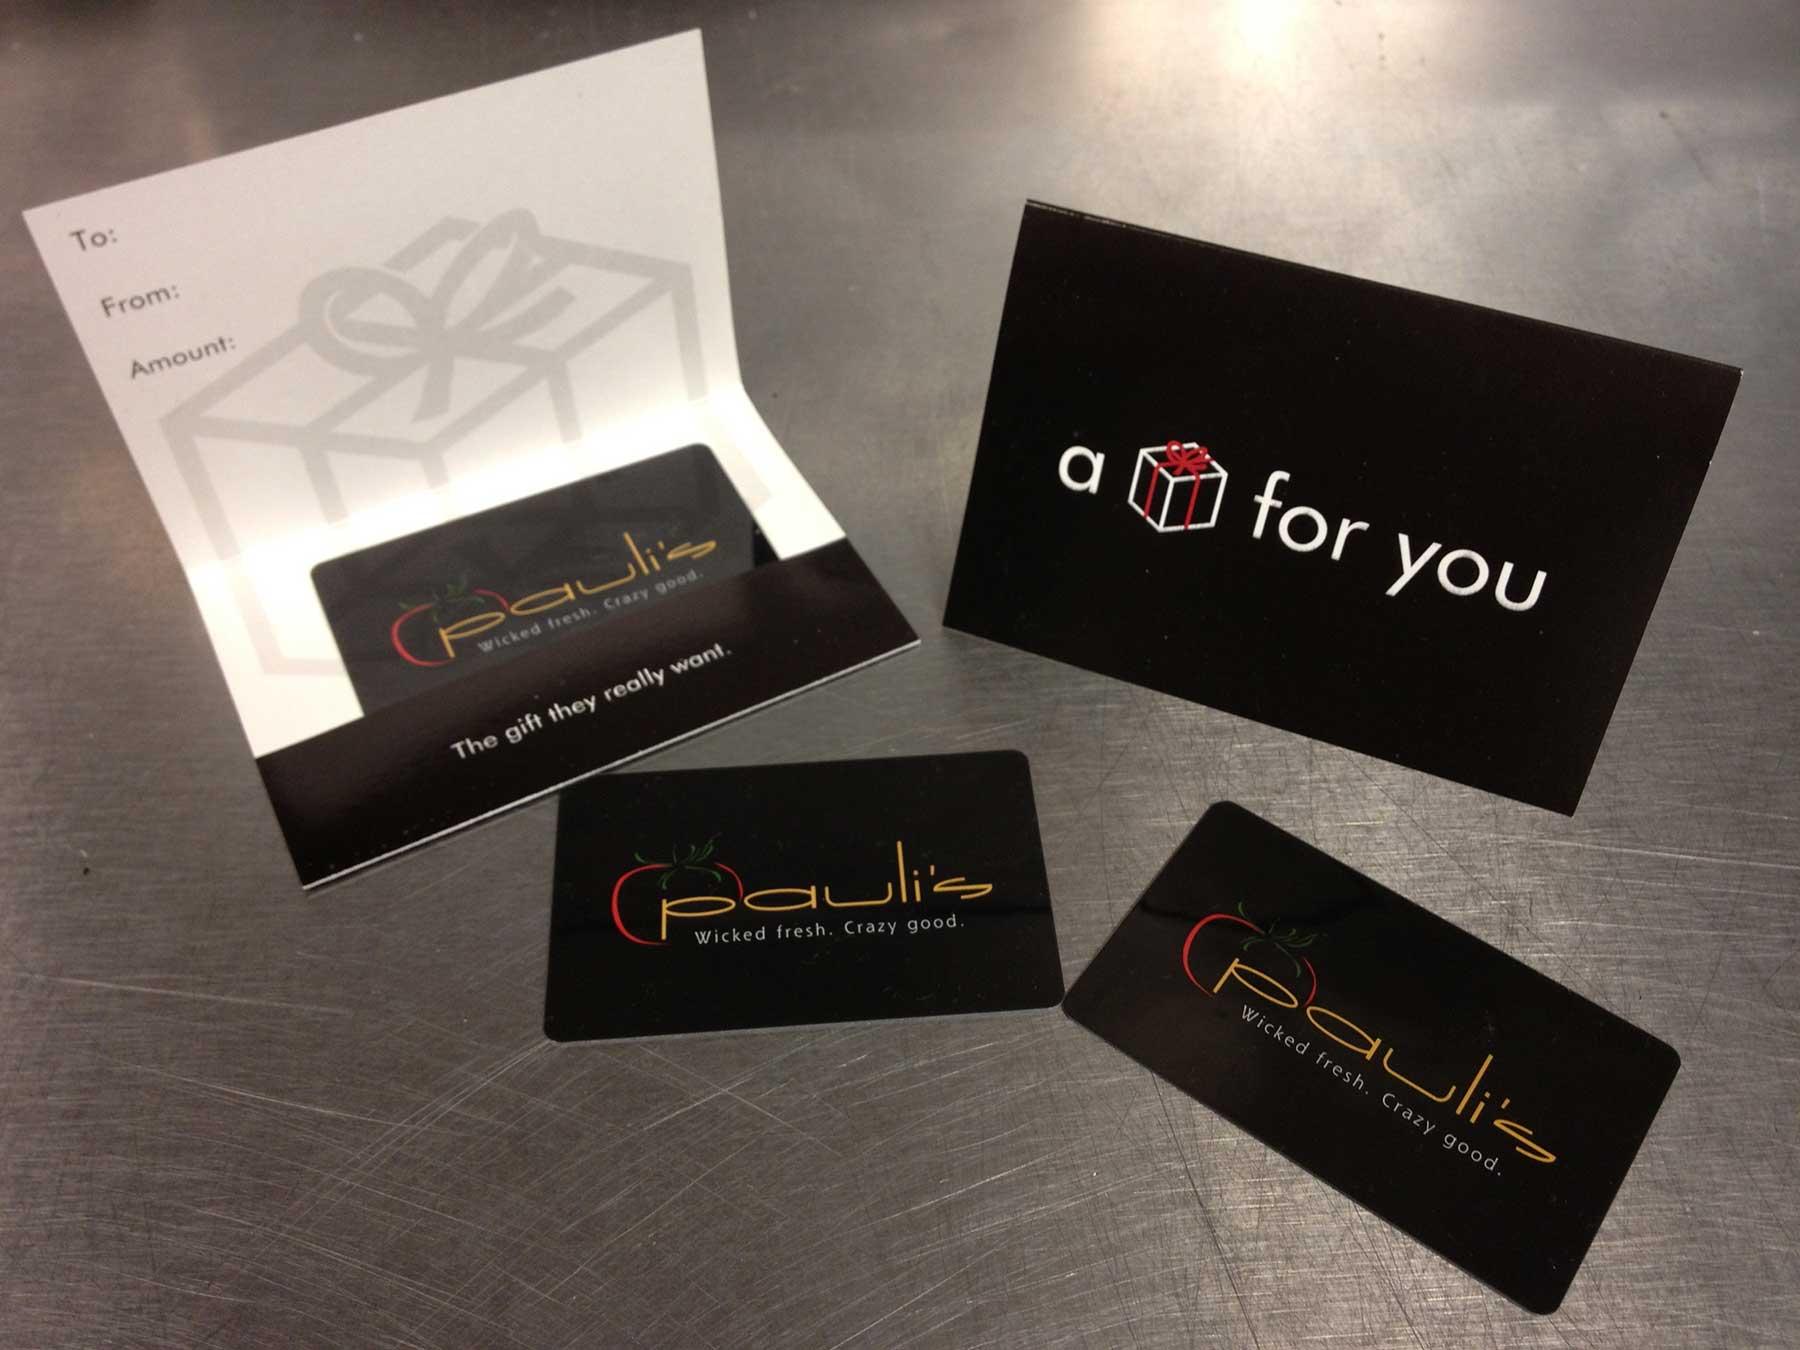 Pauli's Restaurant Gift Card